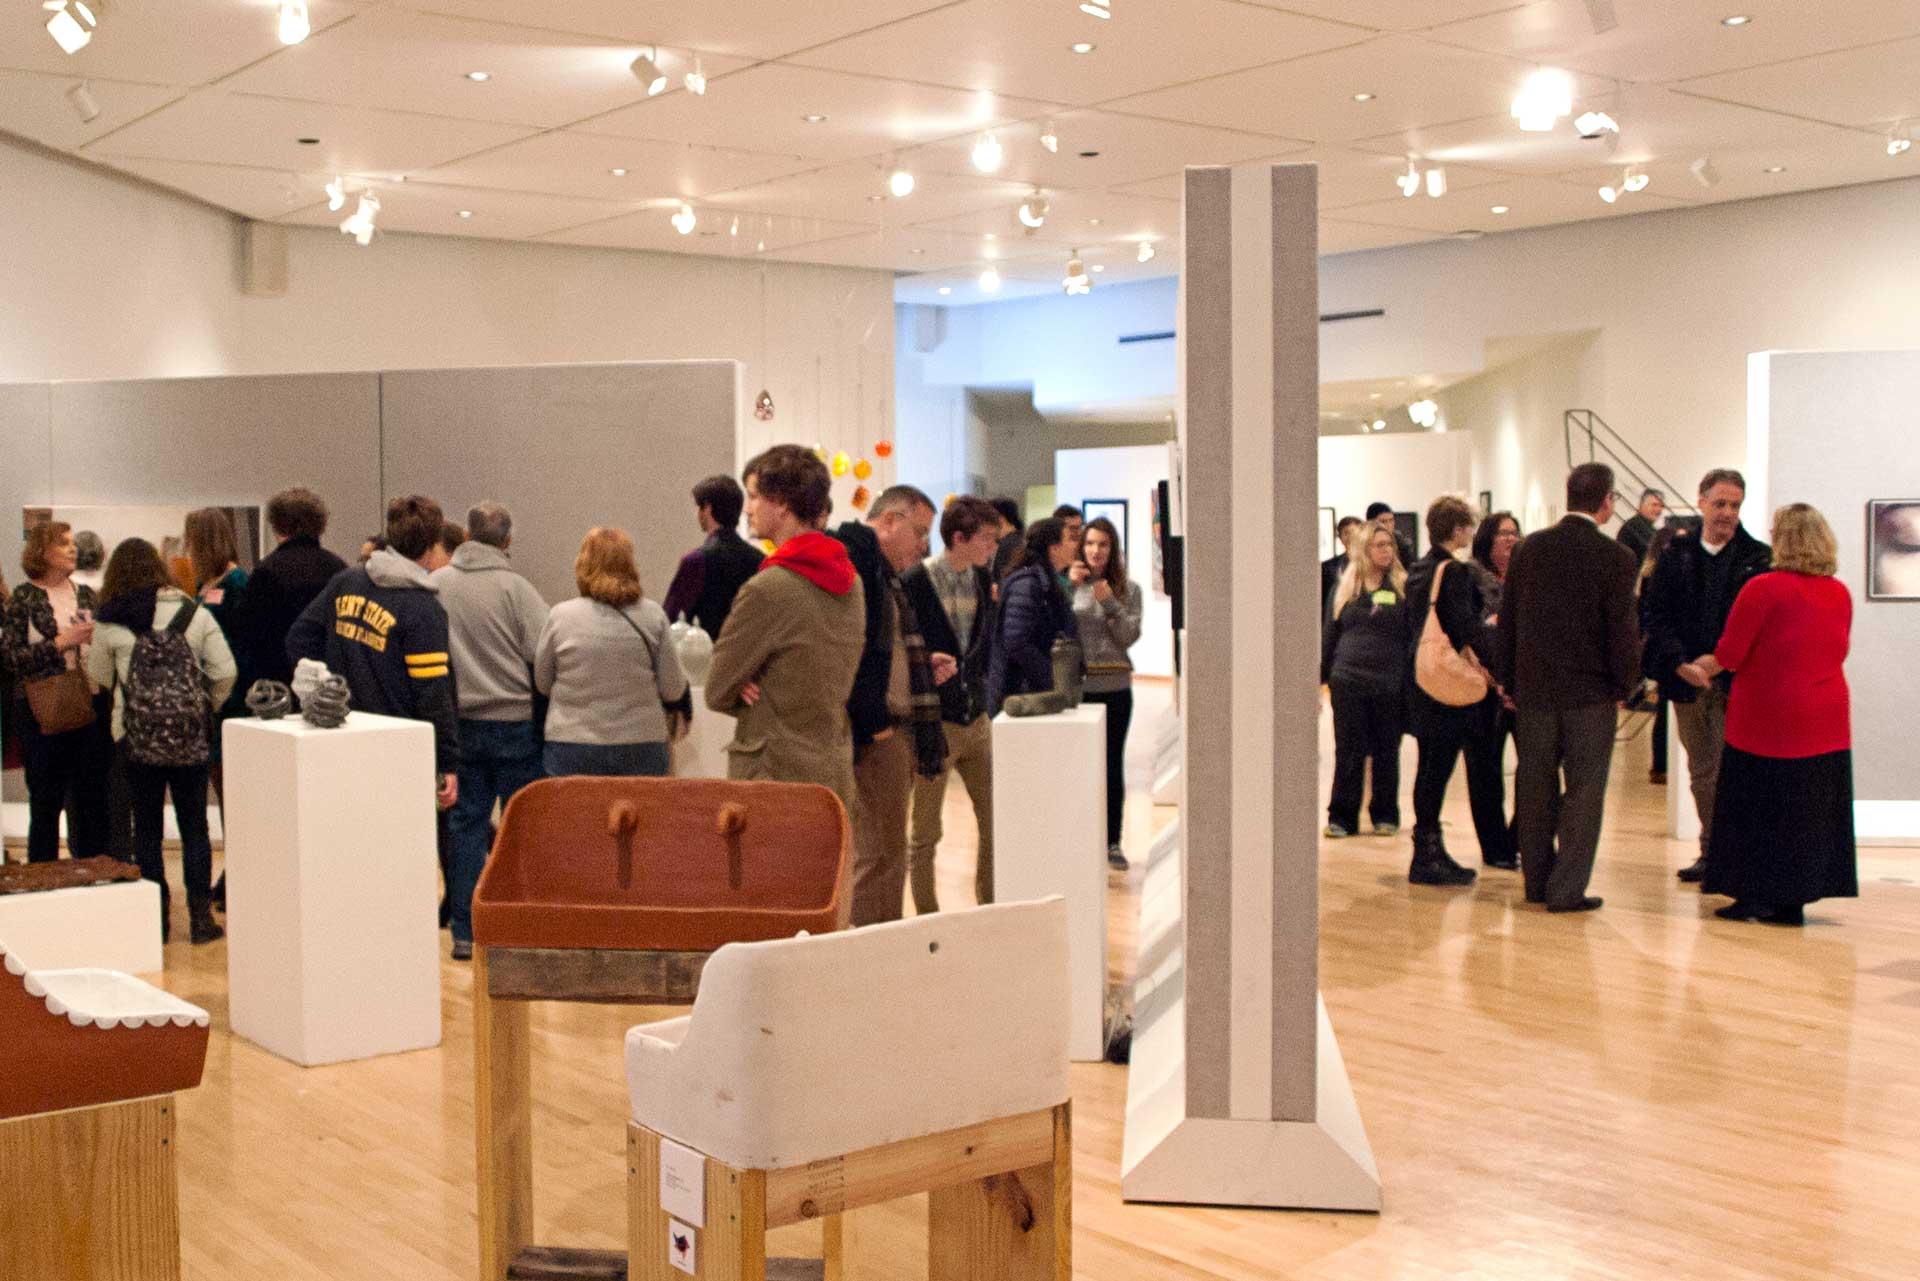 BGSU 2015 Art & Design Undergraduate Exhibition